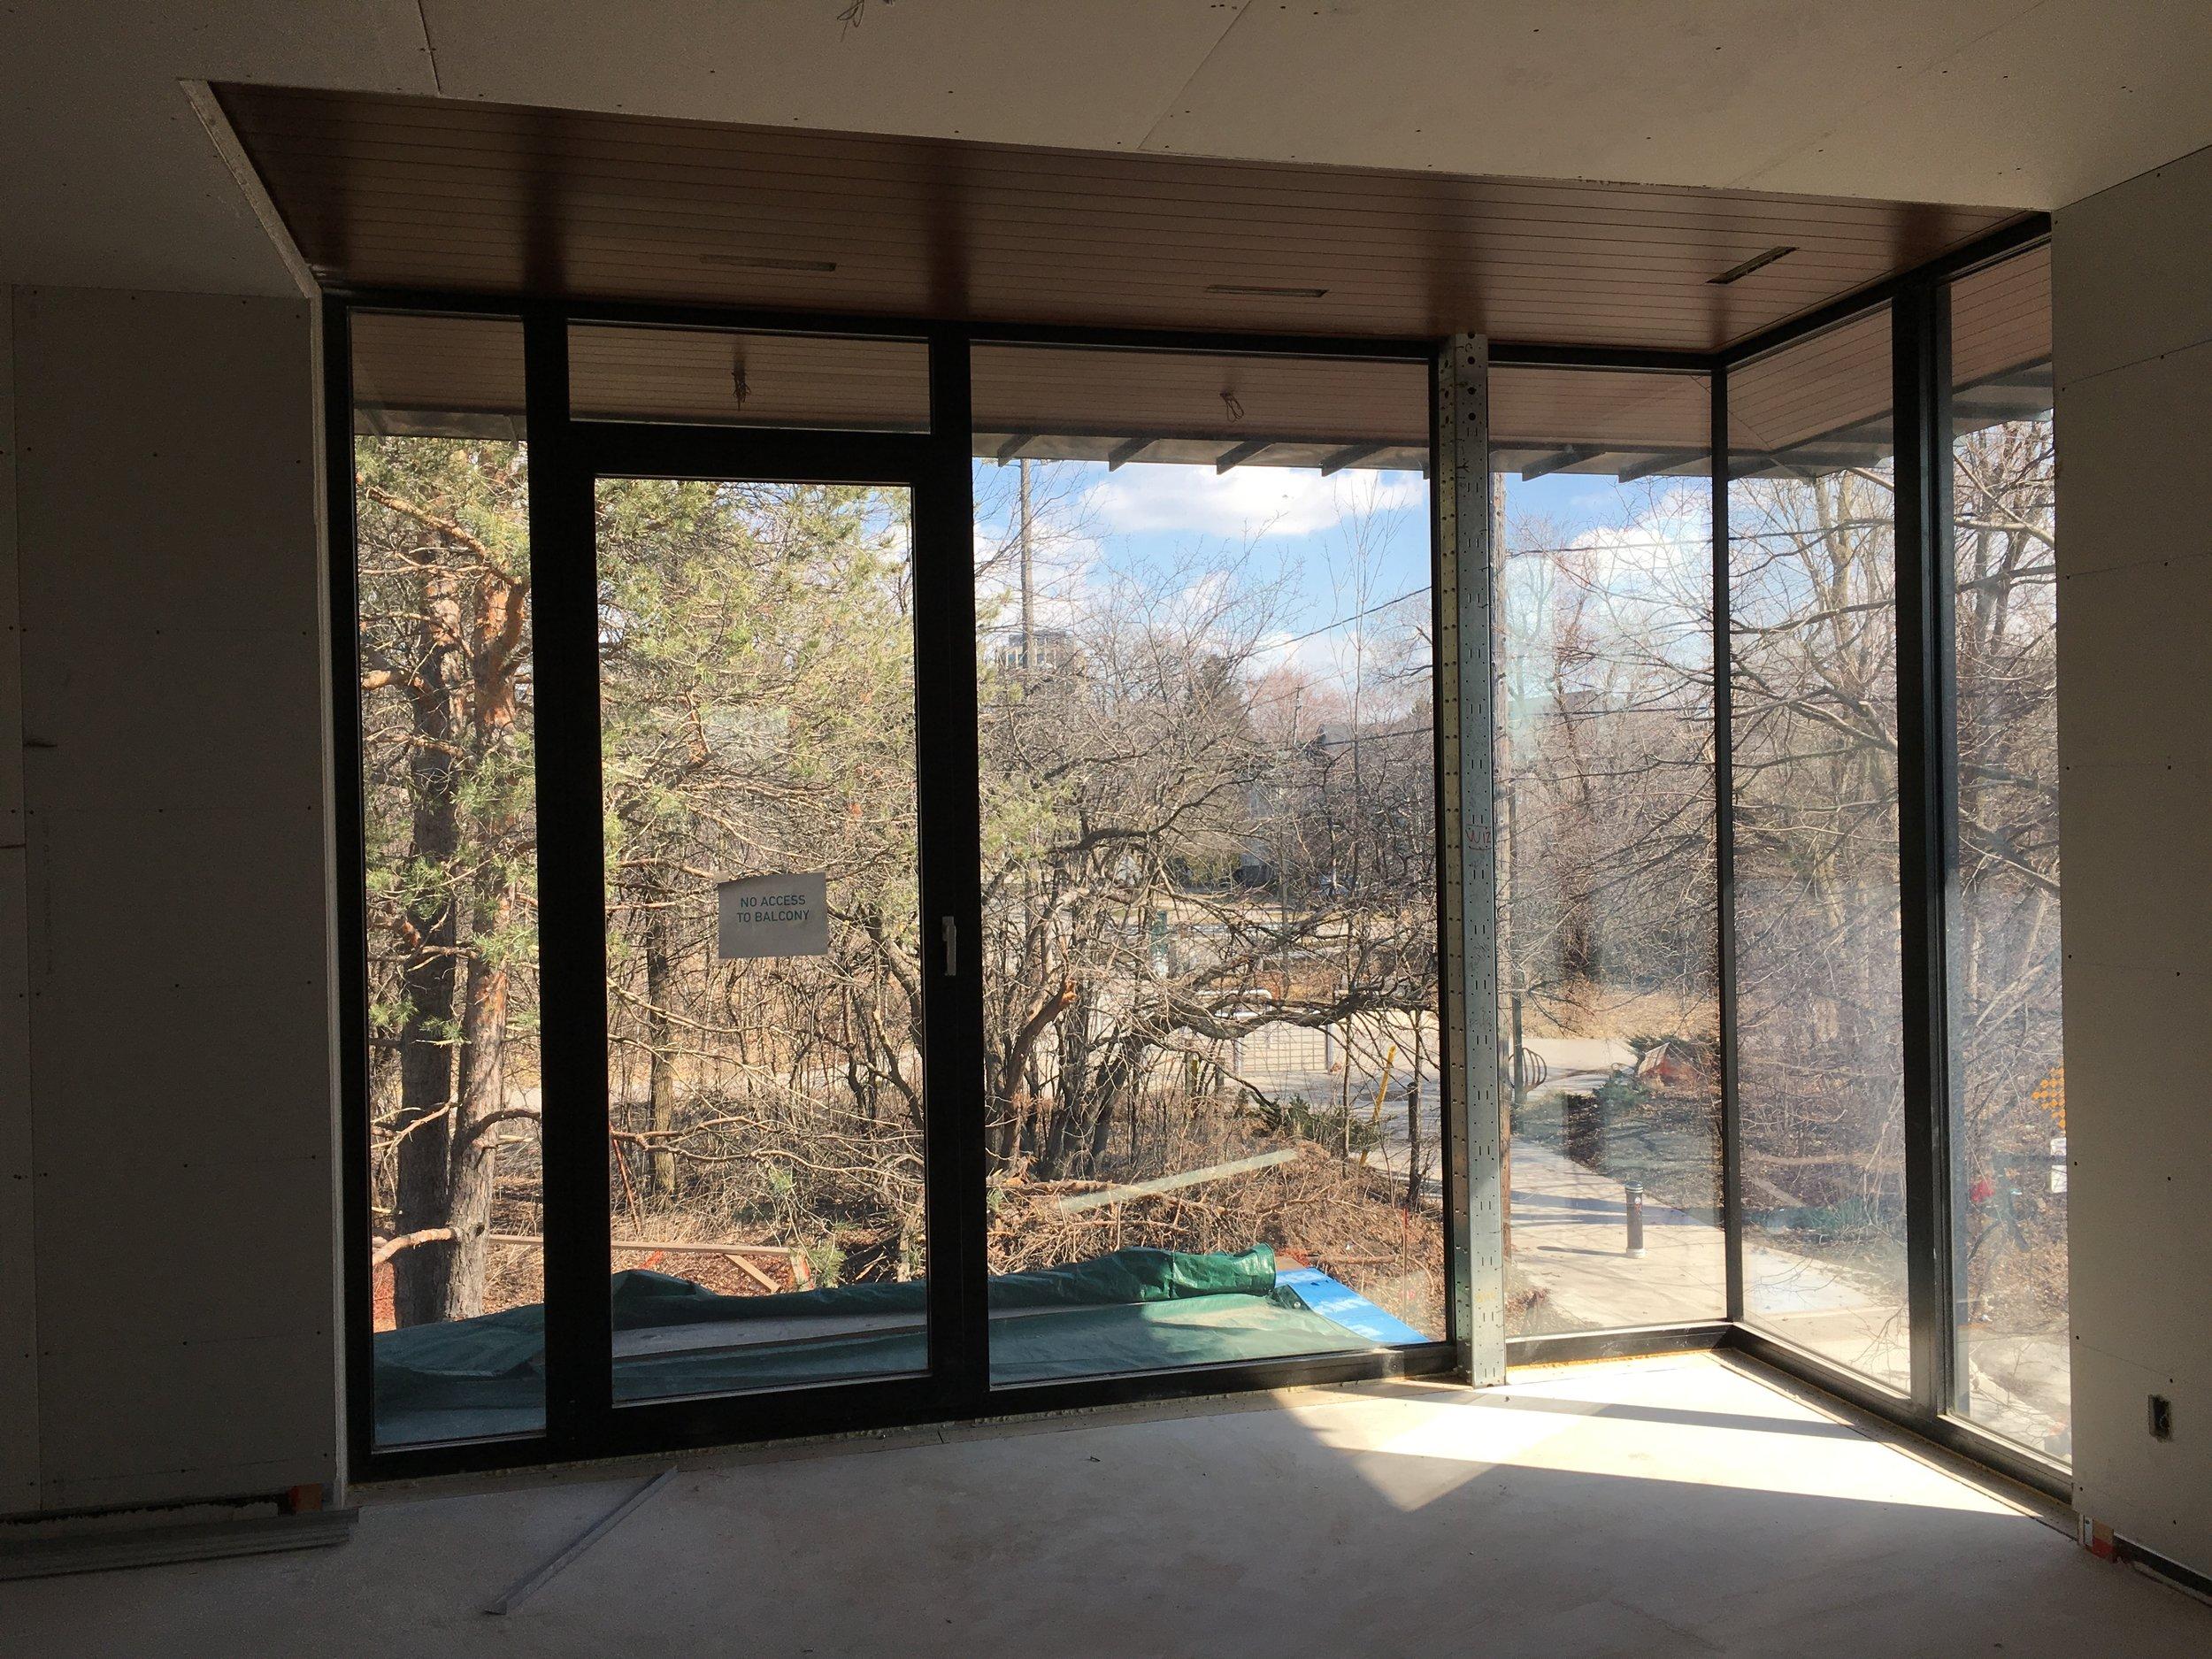 Corner window condition using 65 Series Entrances and Doors.